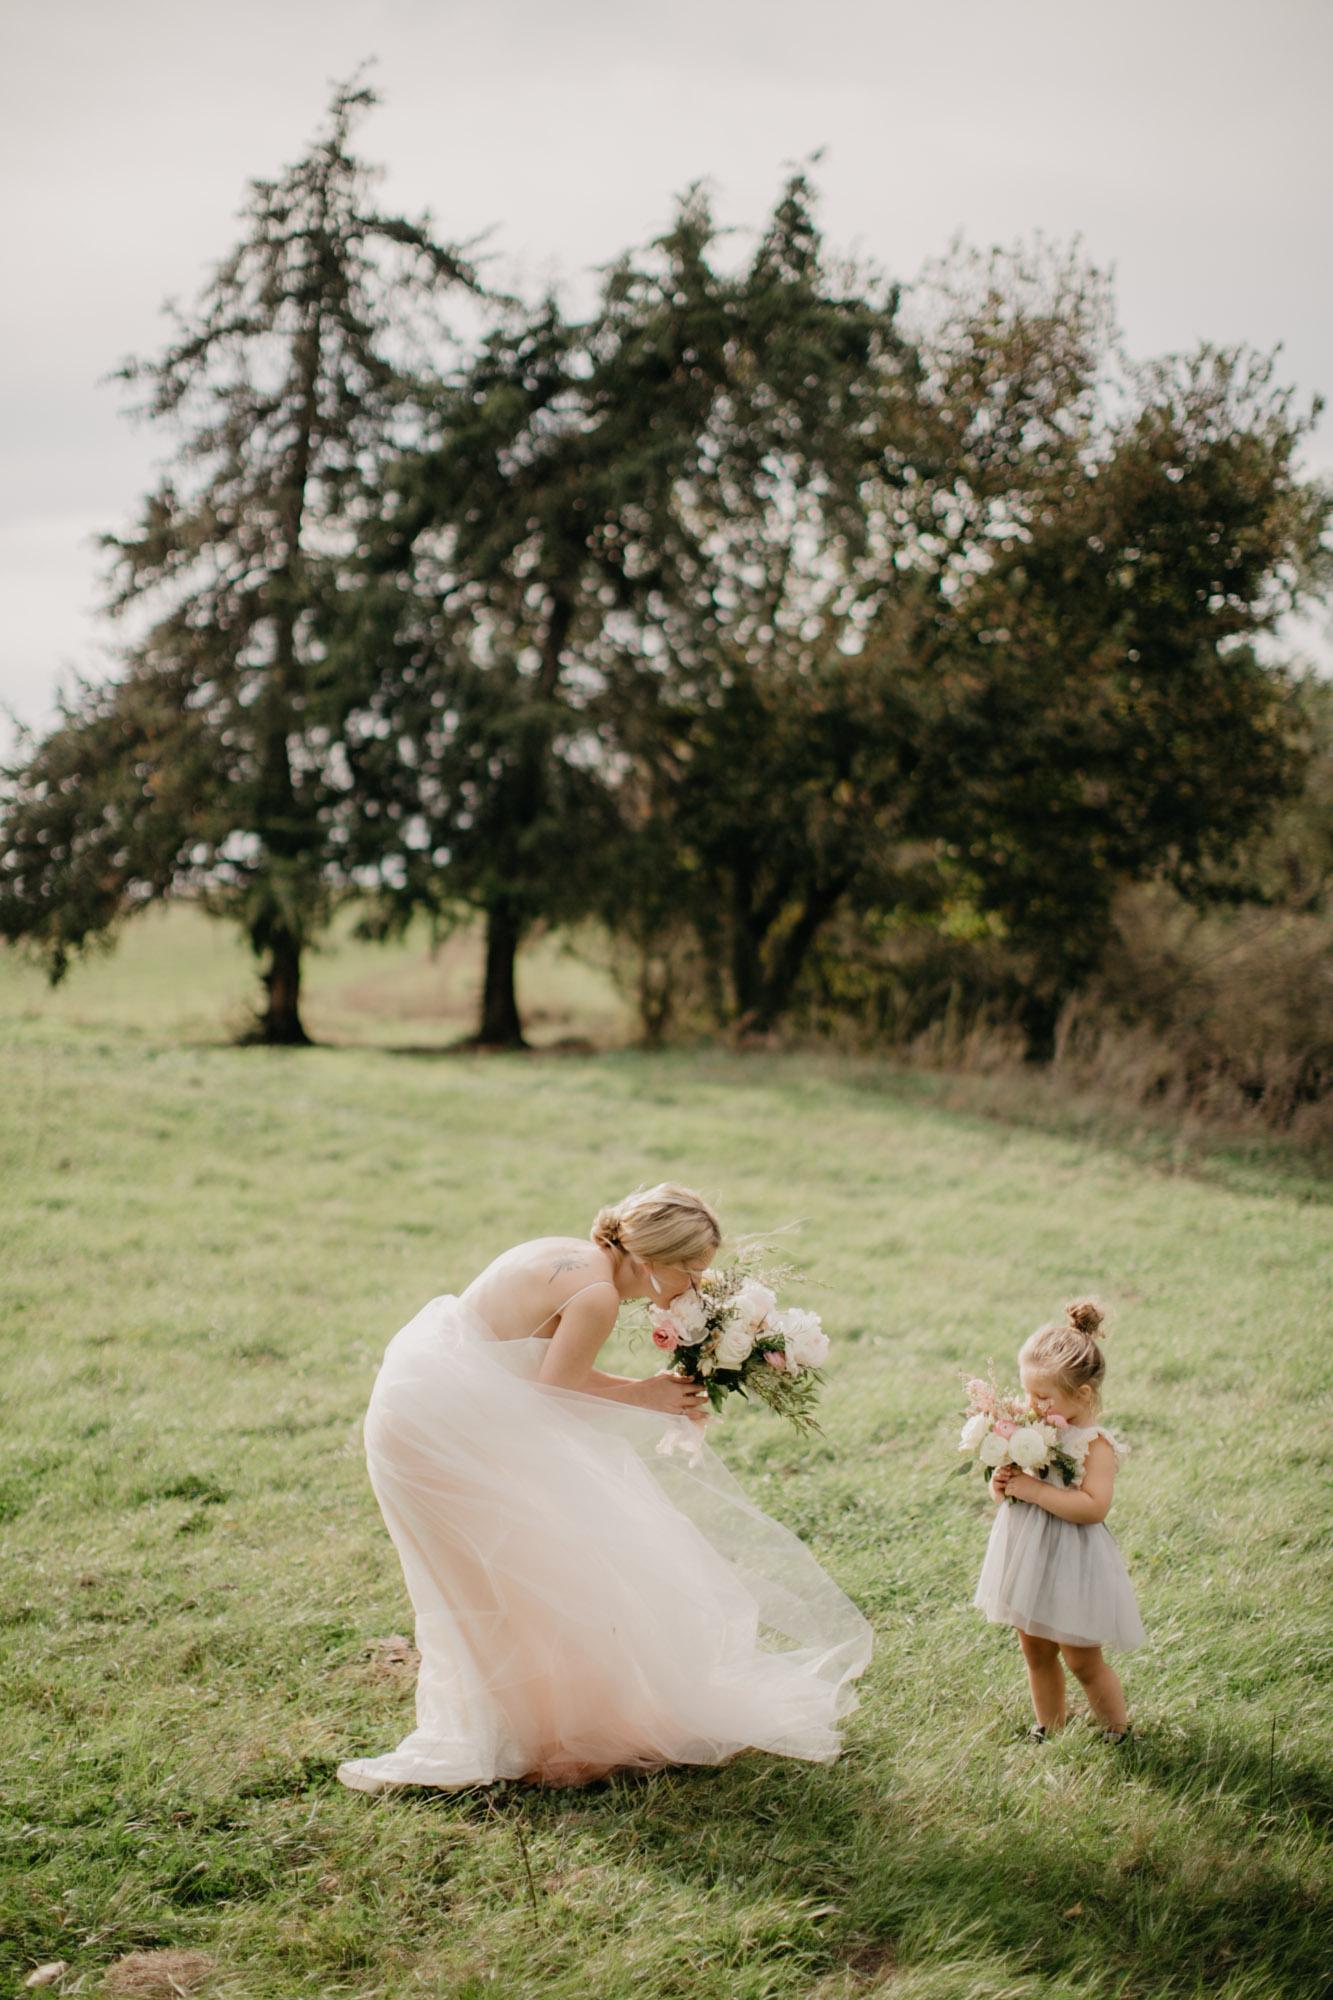 omaha-wedding-photographer-meghan-time-22.jpg